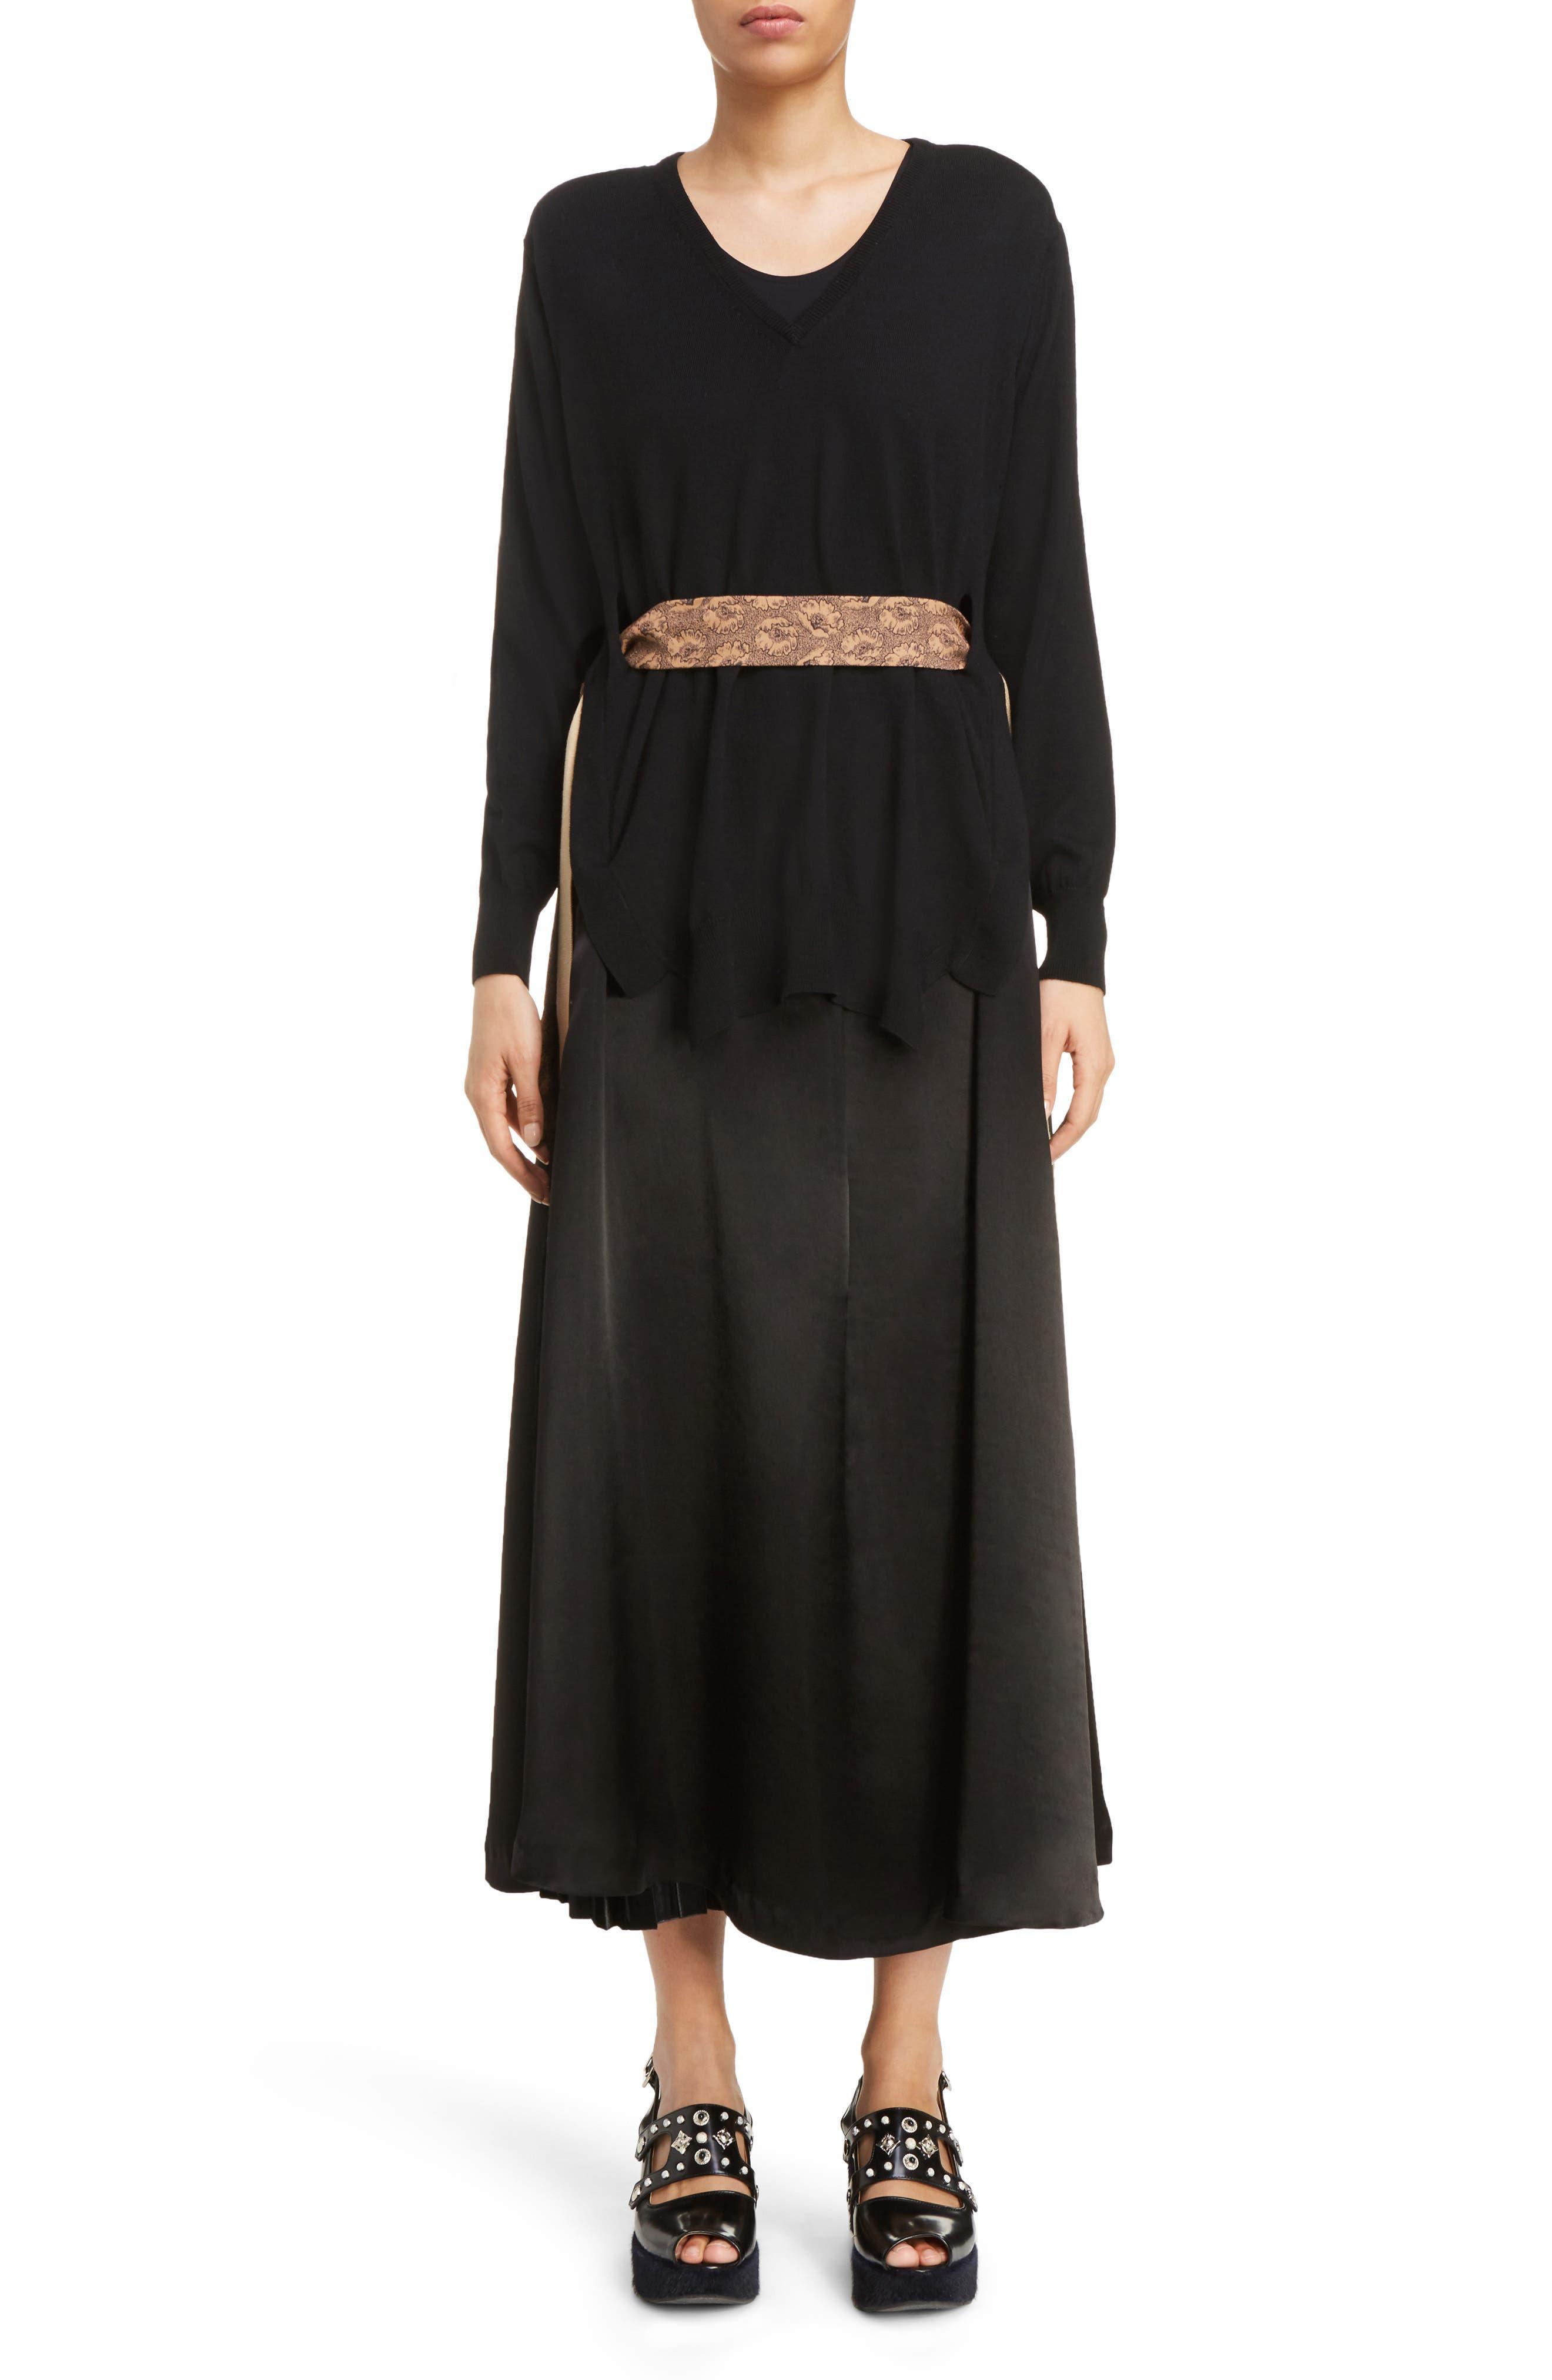 TOGA Layered Mixed Media Dress